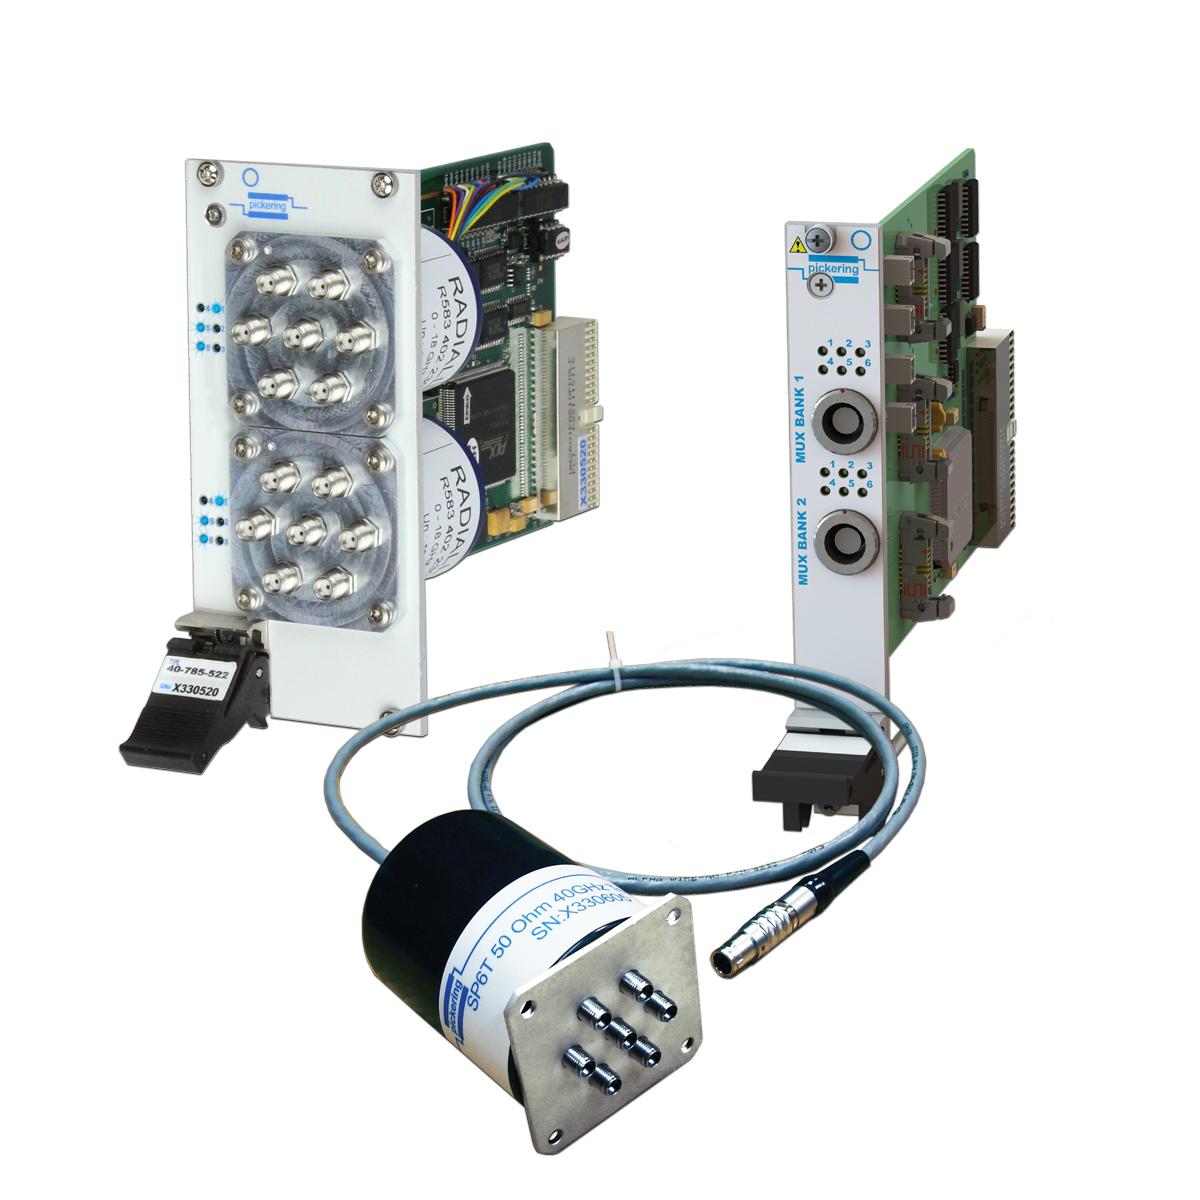 Pickering Interfaces扩展了PXI微波多路复用器产品种类